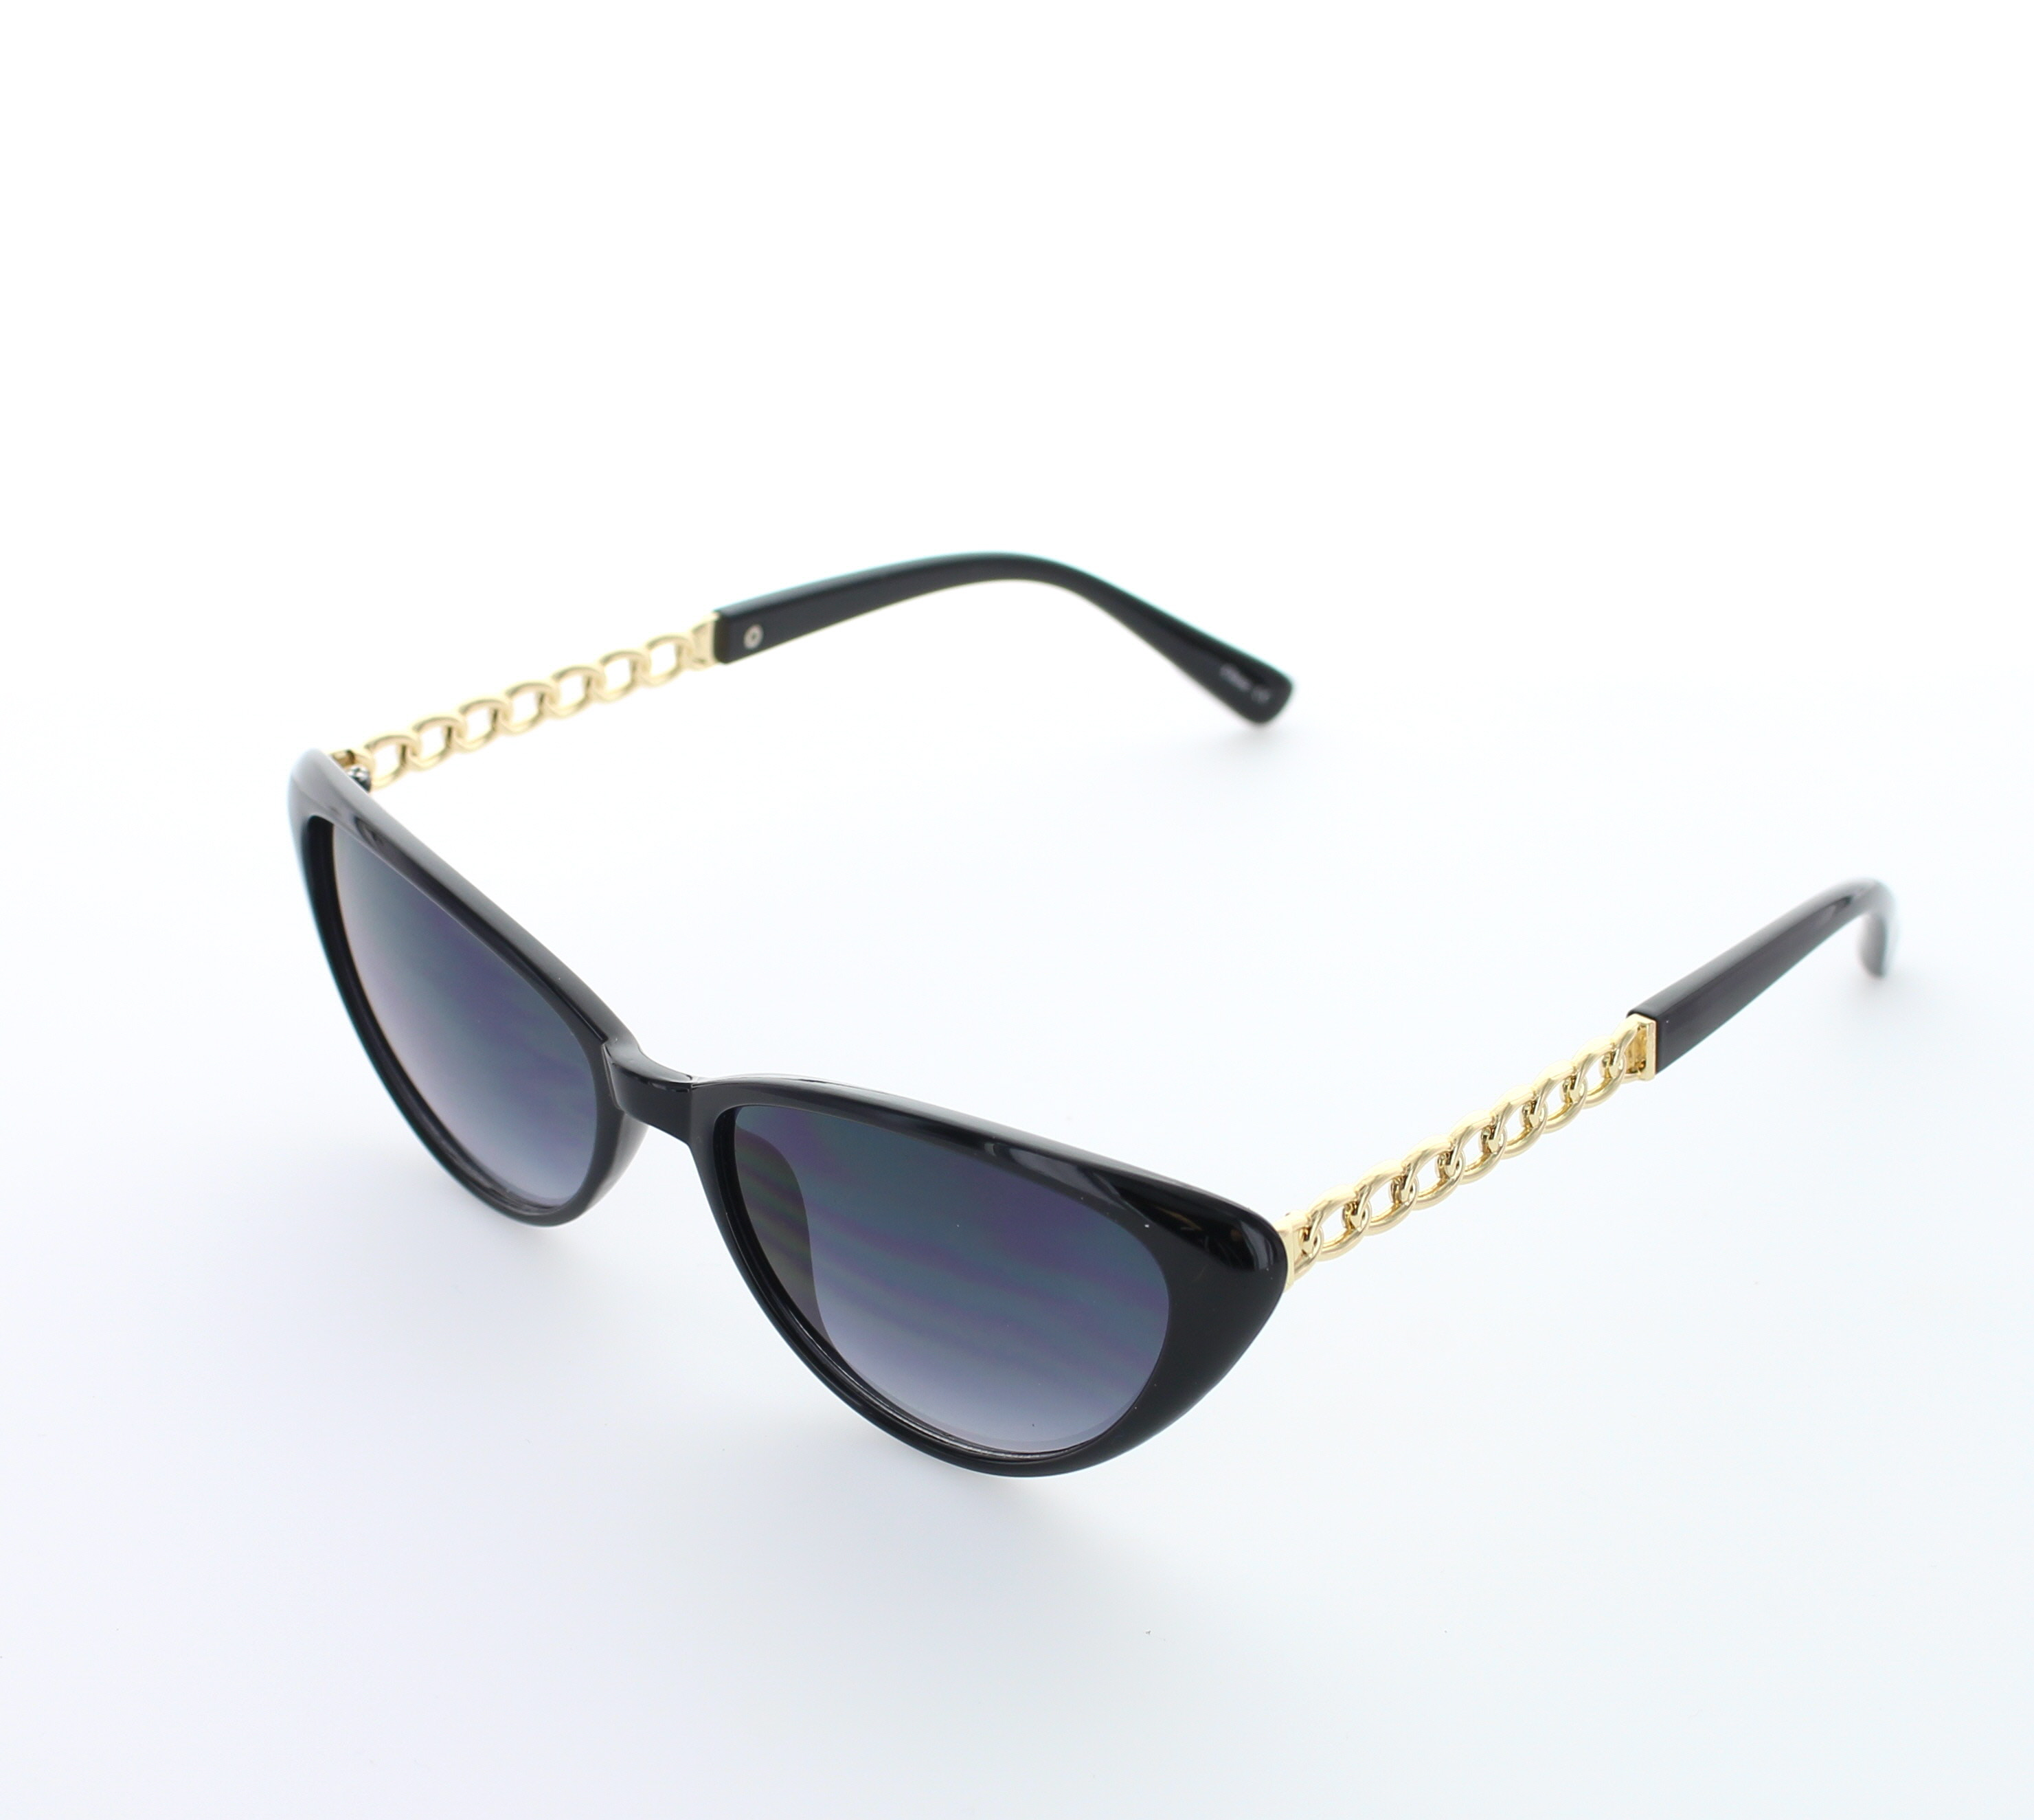 Fashion sunglasses online store 32